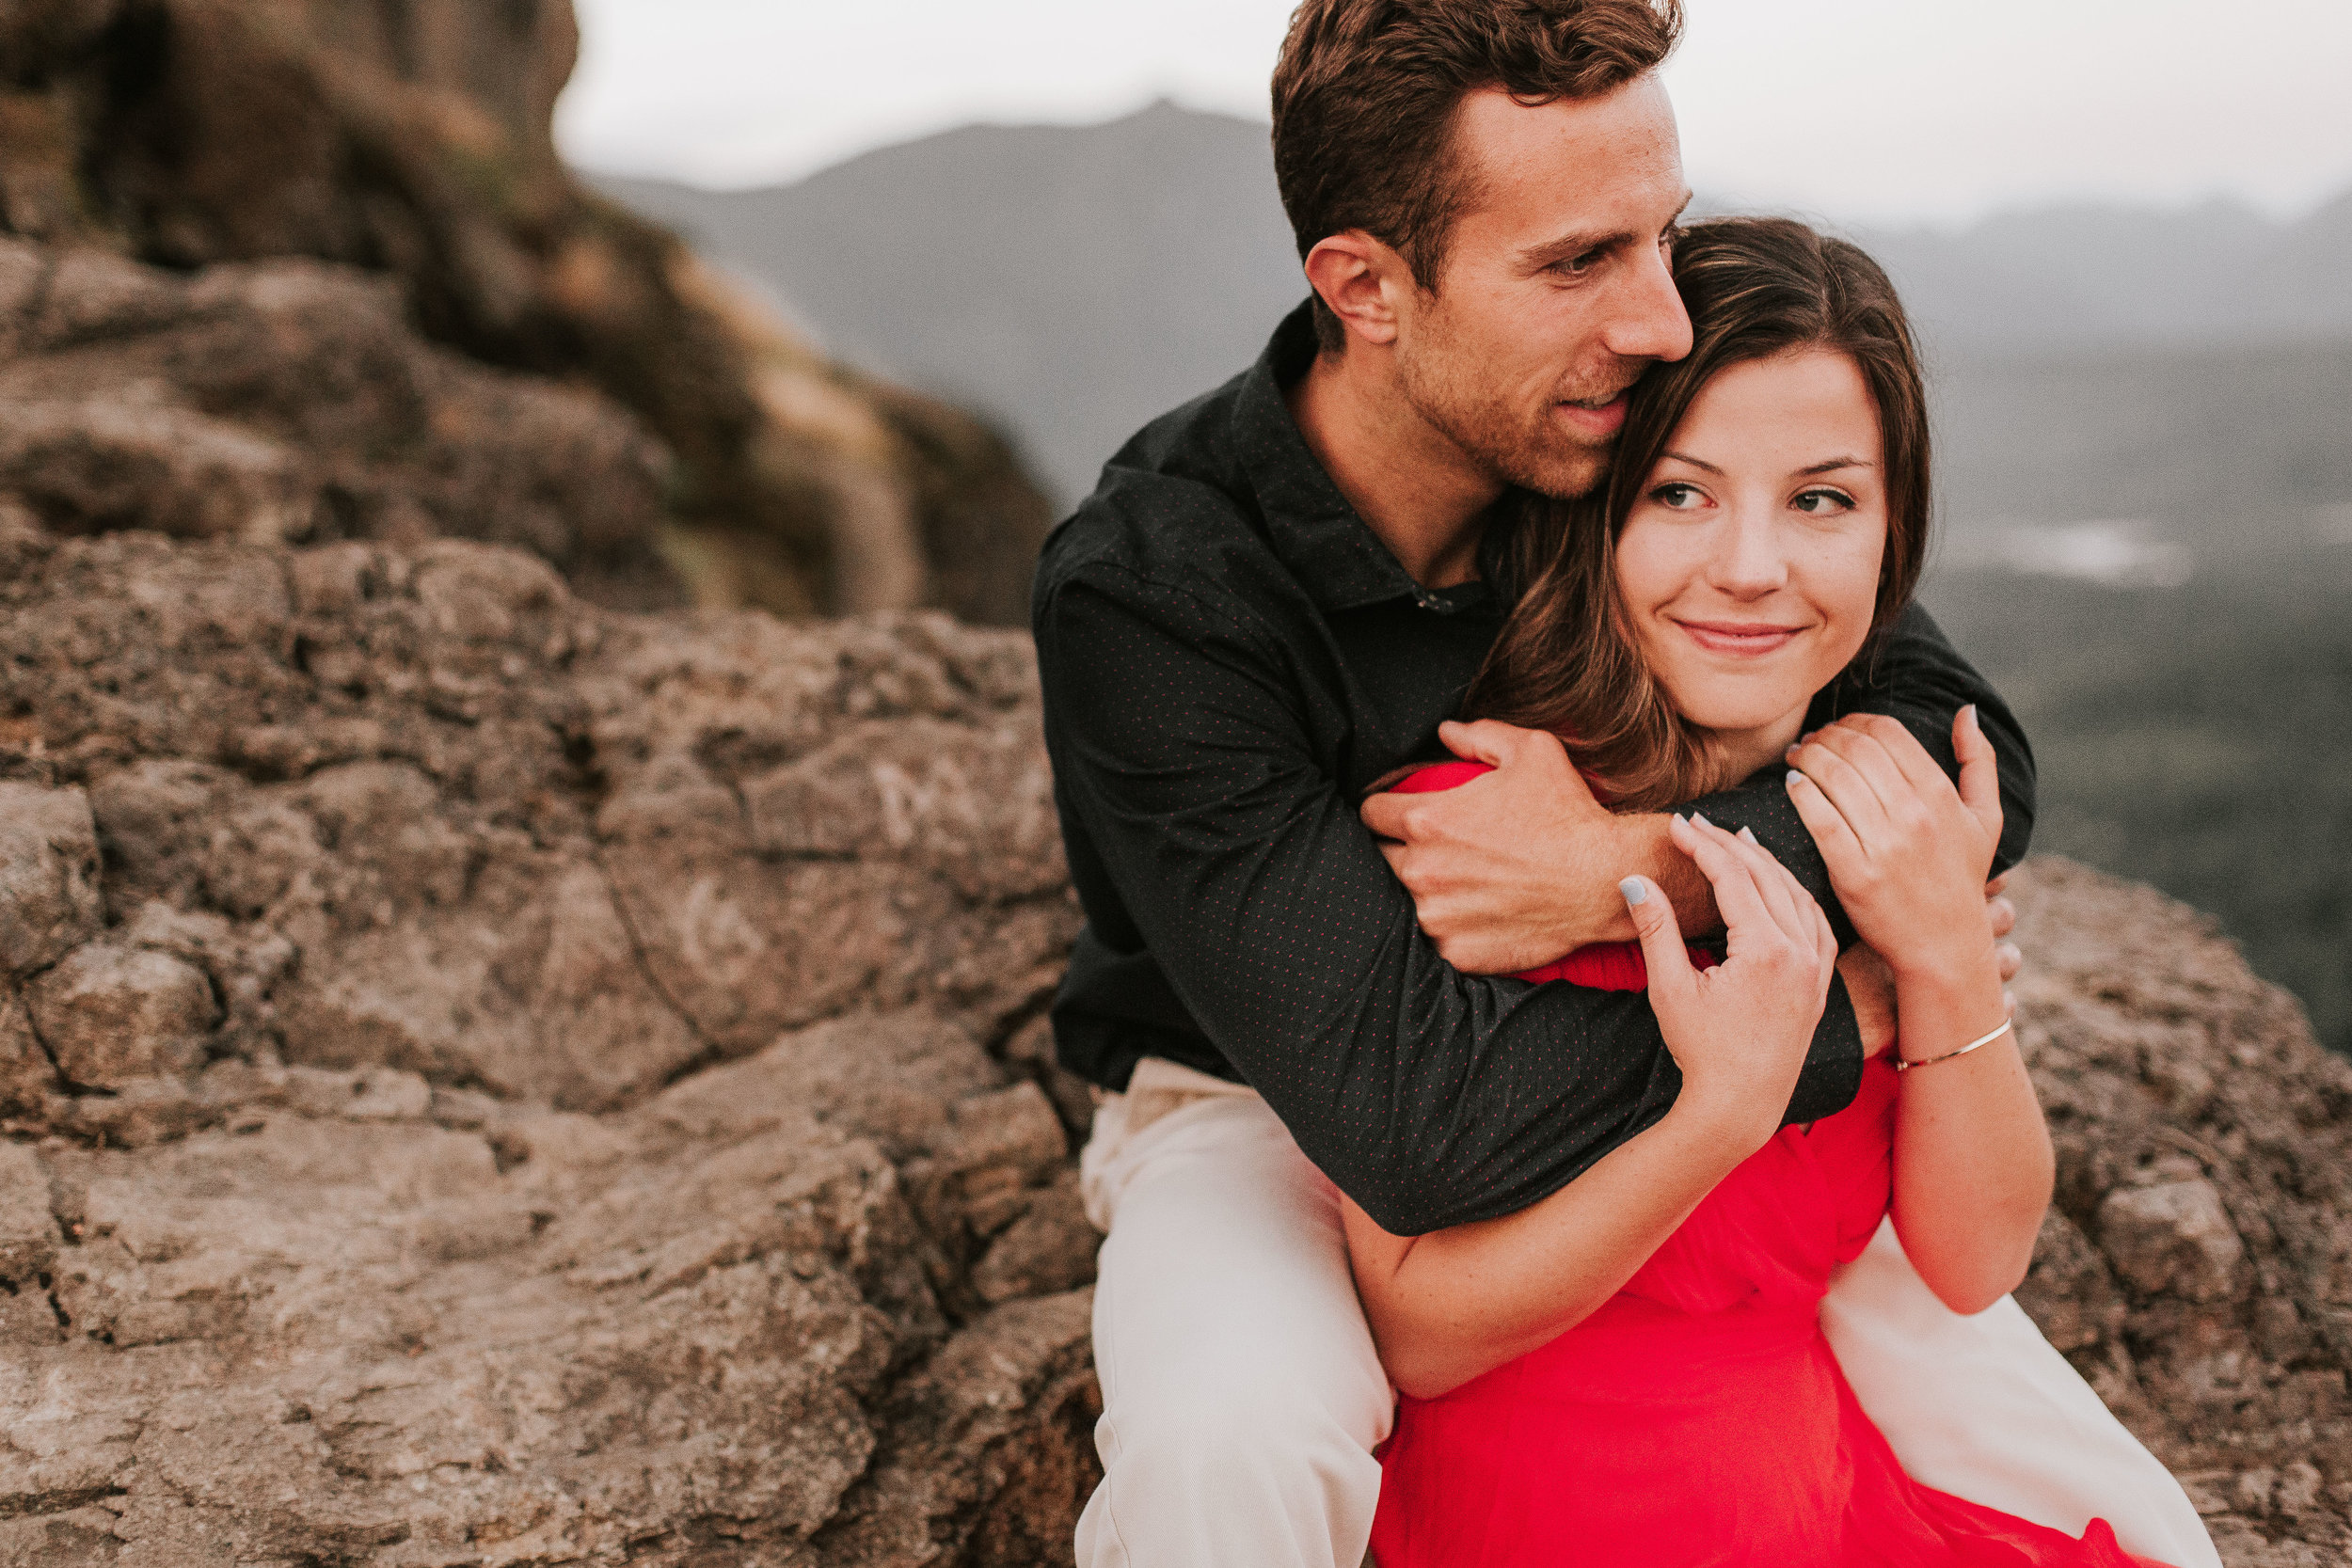 nicole-daacke-photography-rattlesnake-ridge-adventurous-engagement-session-hiking-seattle-washington-destinatino-elopement-intimate-wedding-photographer-35.jpg